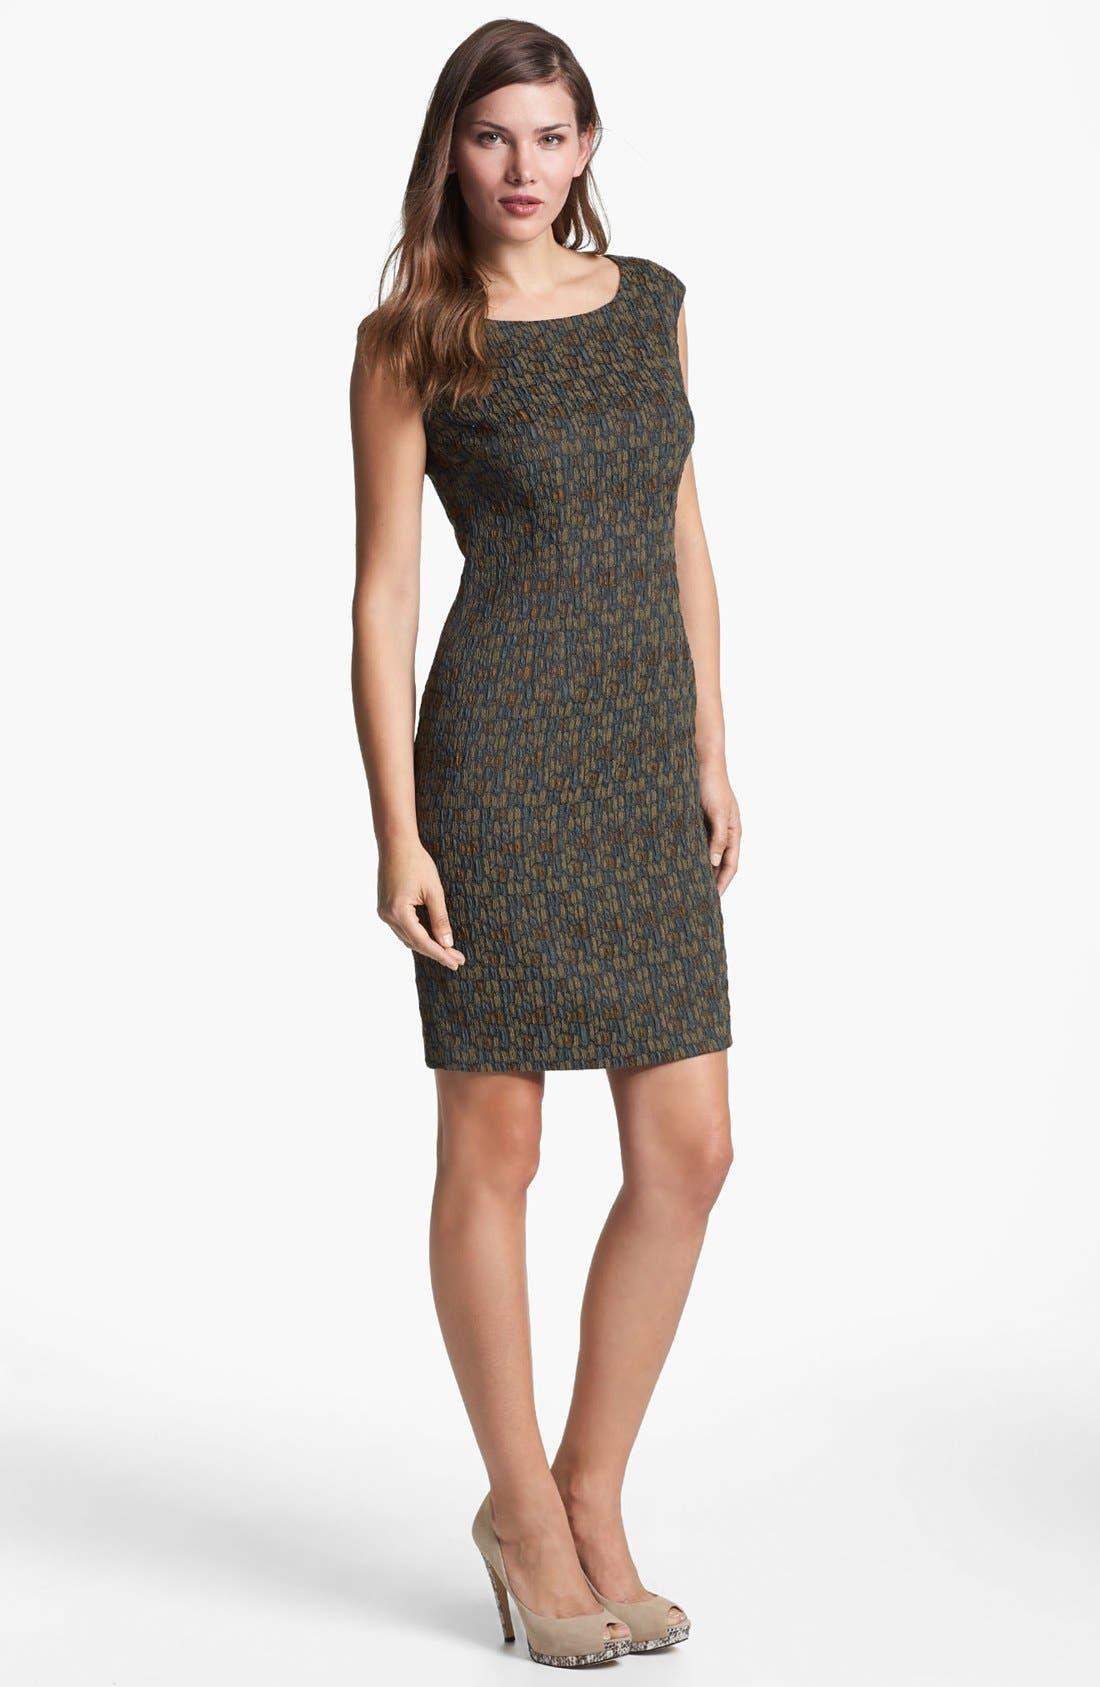 Alternate Image 1 Selected - Lafayette 148 New York 'Bianca - Fossilized Jacquard' Dress